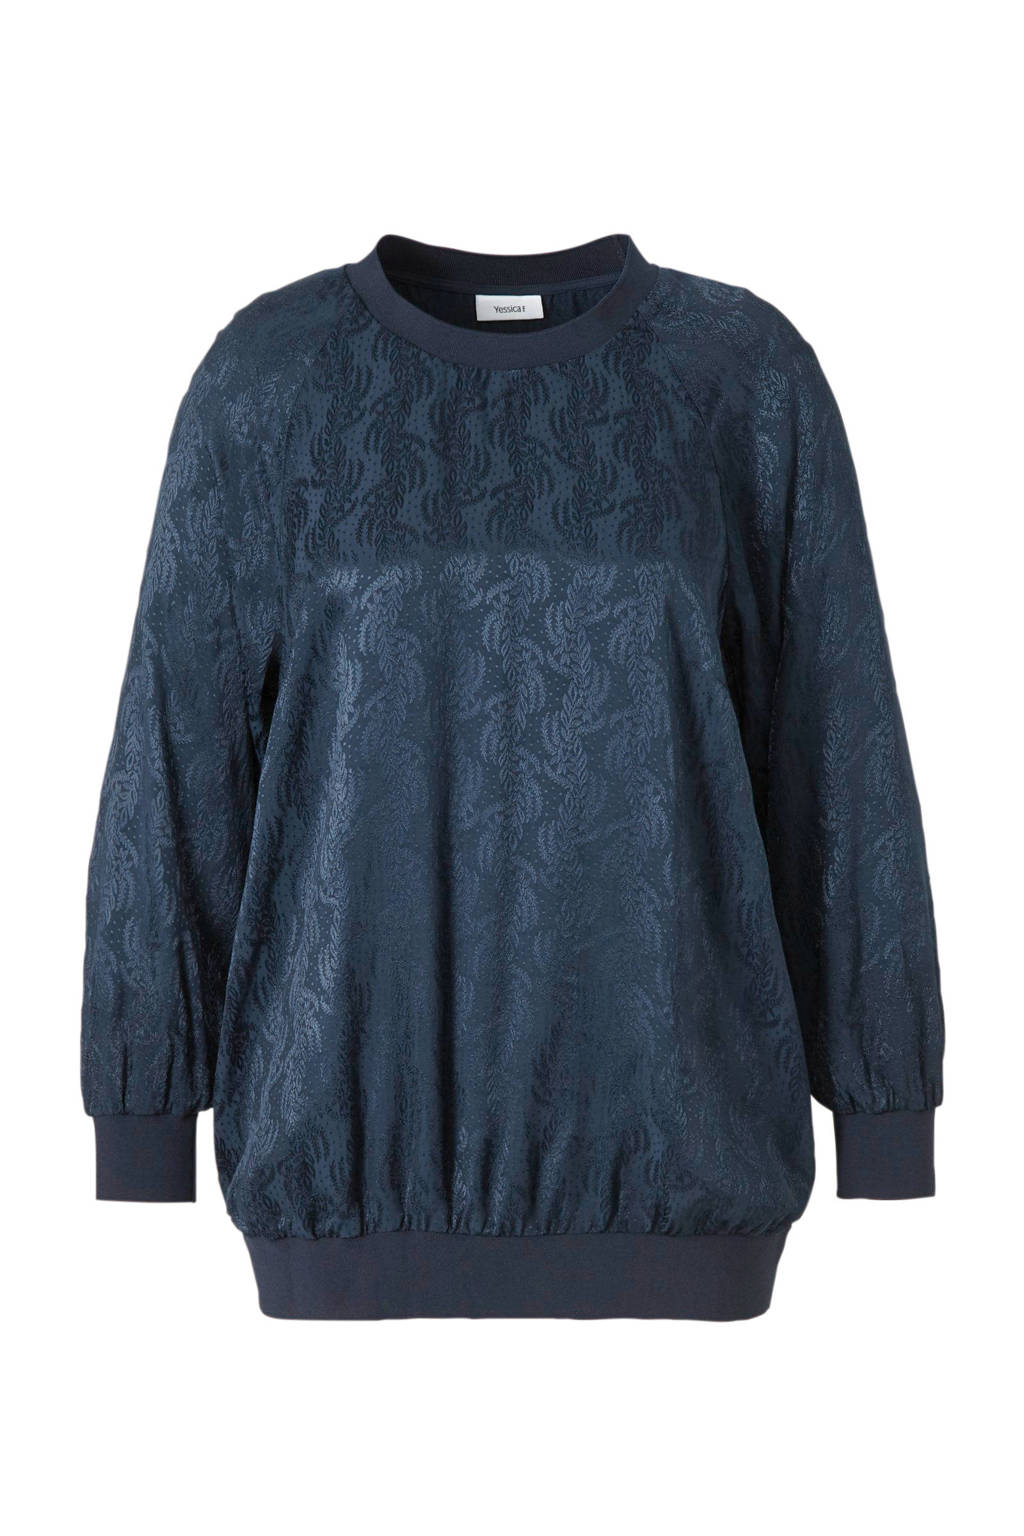 C&A XL Yessica top met jacquard en glitters donkerblauw, Donkerblauw